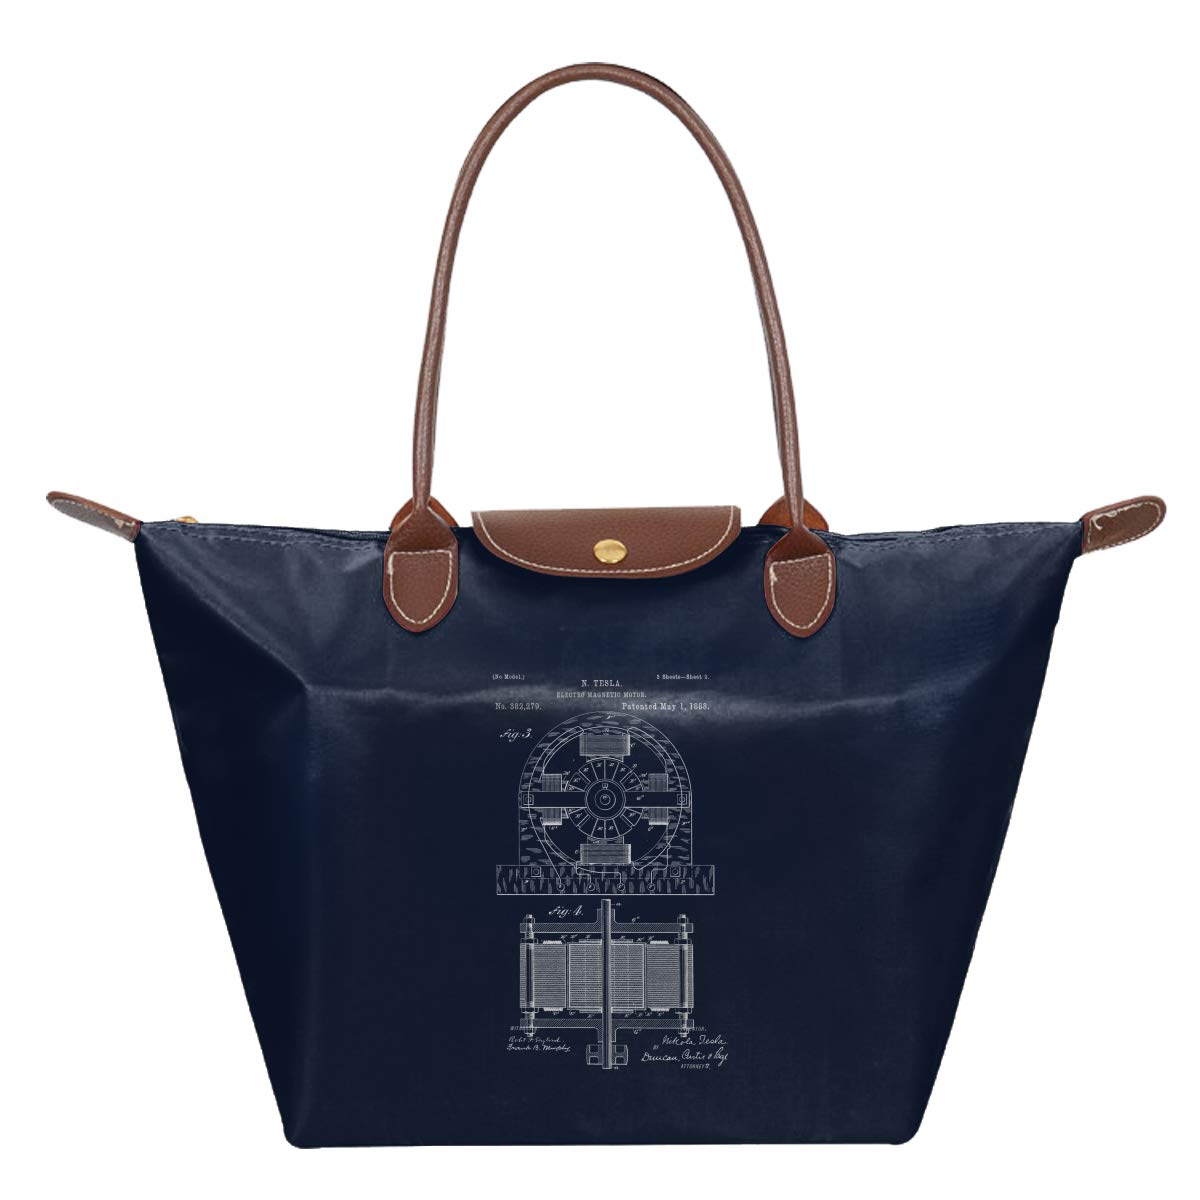 Nicola Tesla 1 Waterproof Leather Folded Messenger Nylon Bag Travel Tote Hopping Folding School Handbags